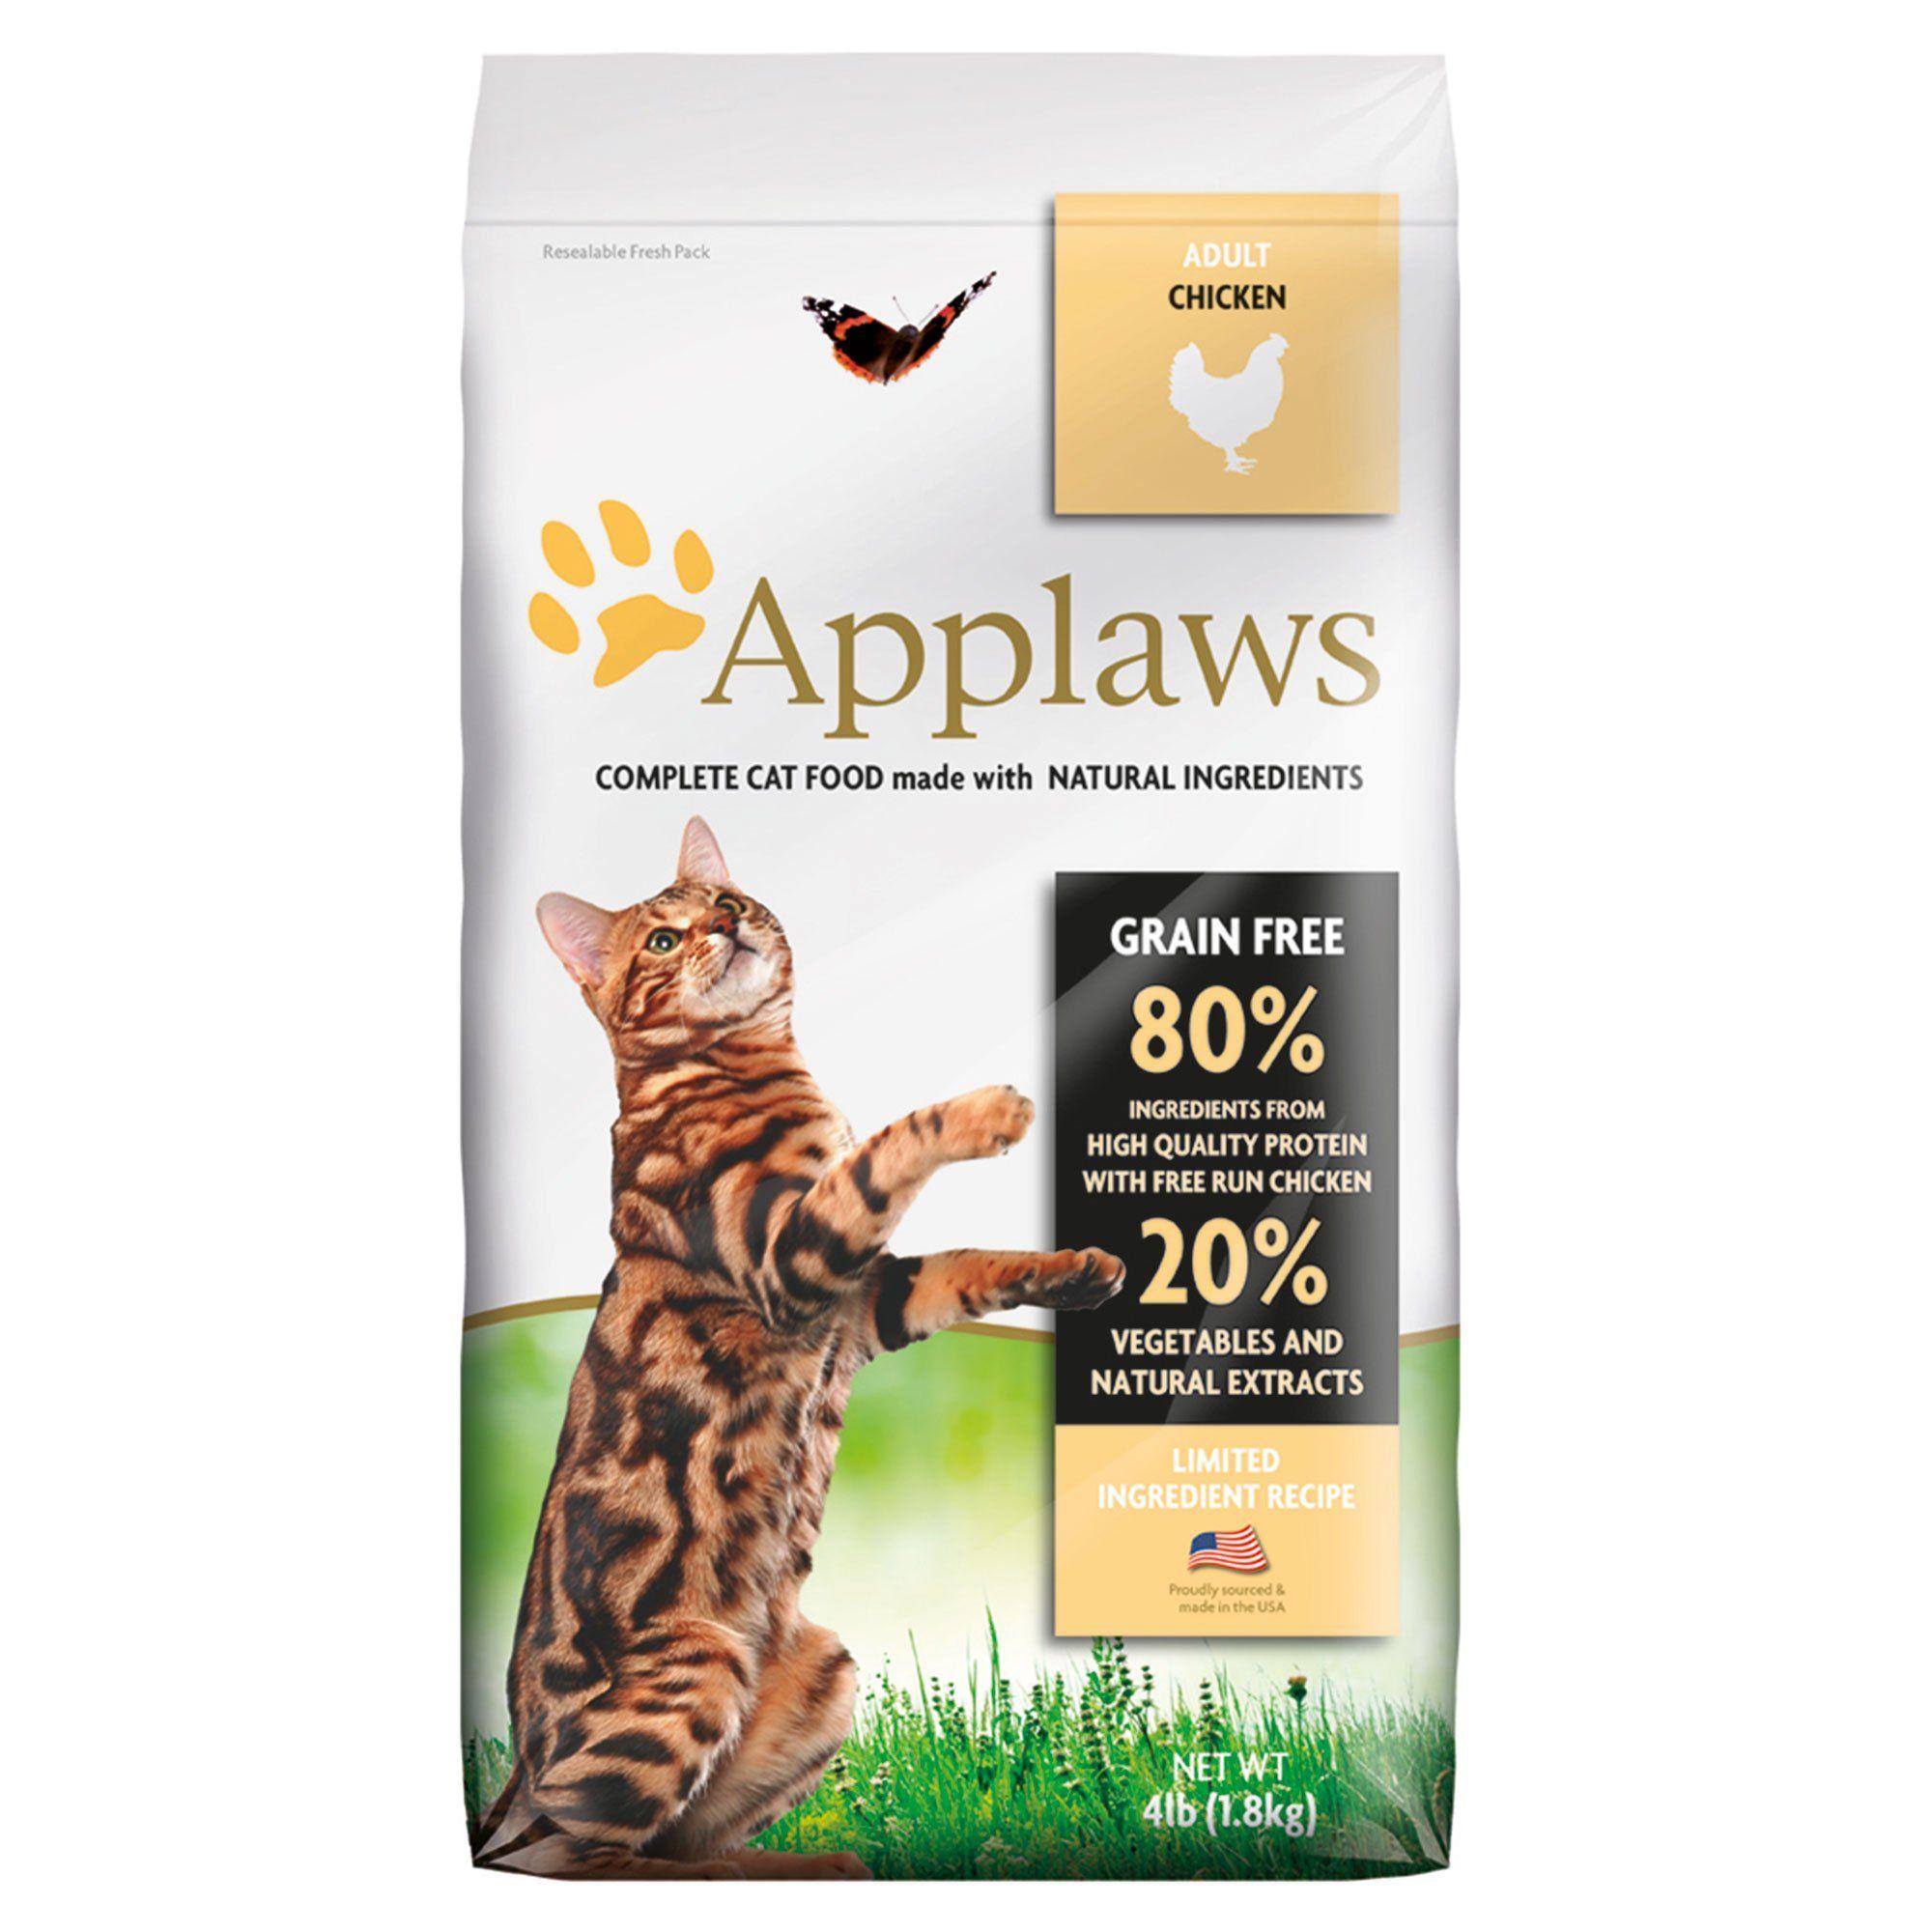 Free applaws dog cat food dry cat food cat food